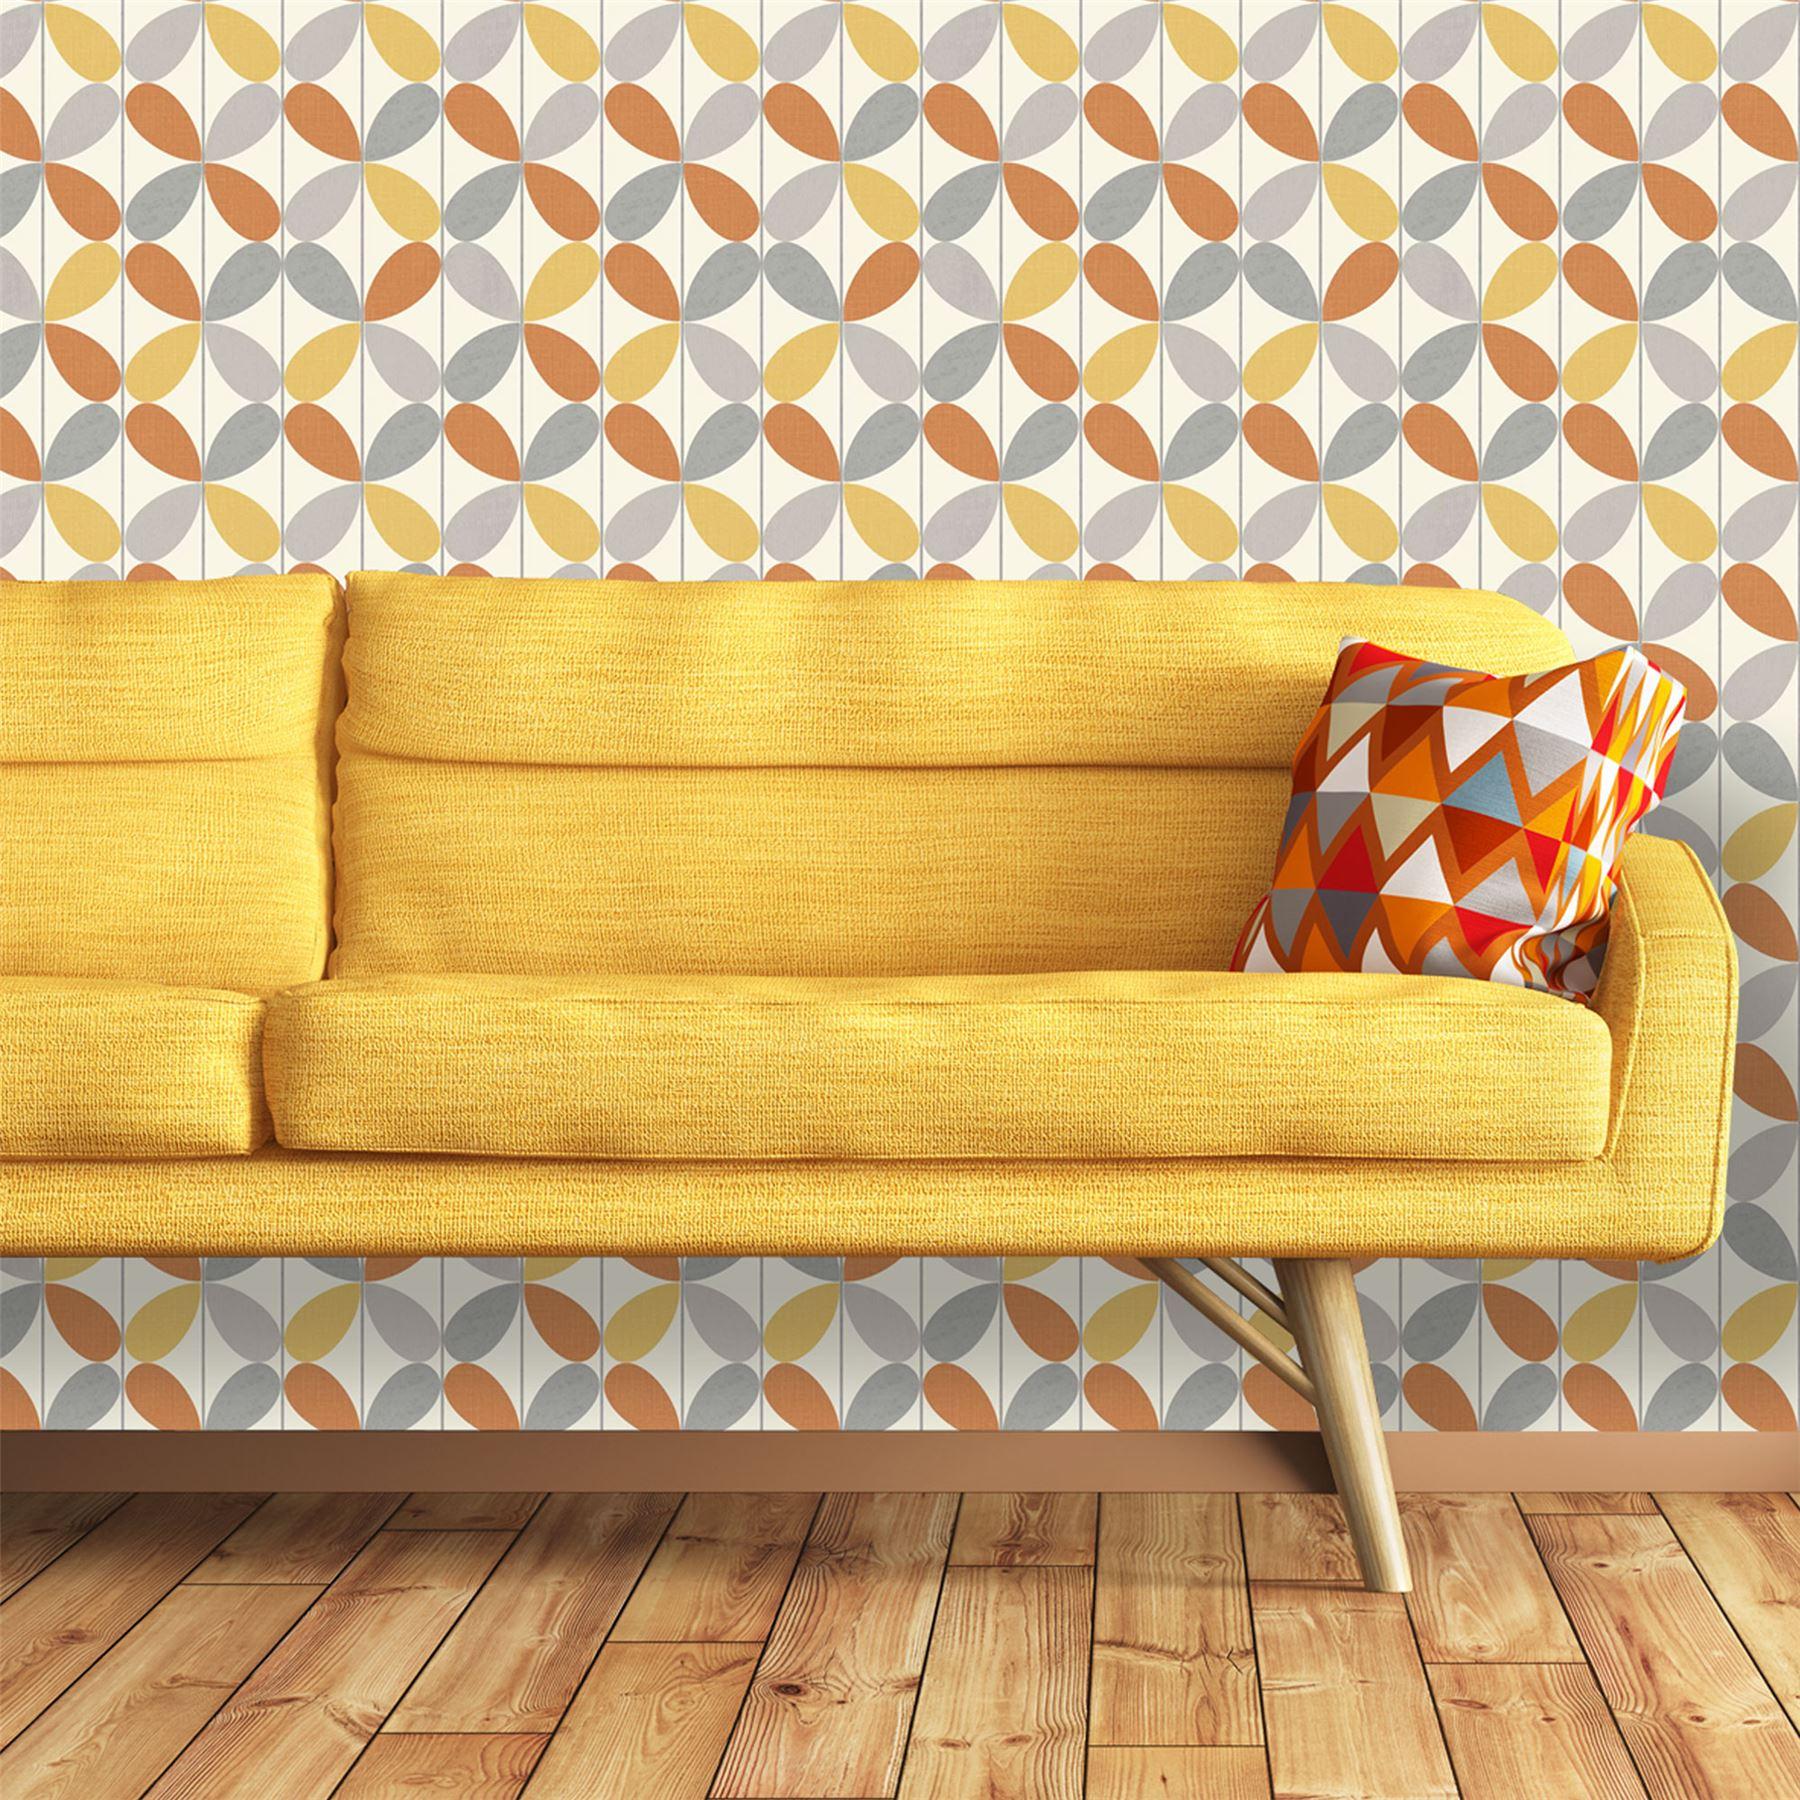 Detalles De Fondo De Pantalla Retro Geométrico Vintage Funky Audaz Vibrante Naranja Amarillo Arthouse Ver Título Original